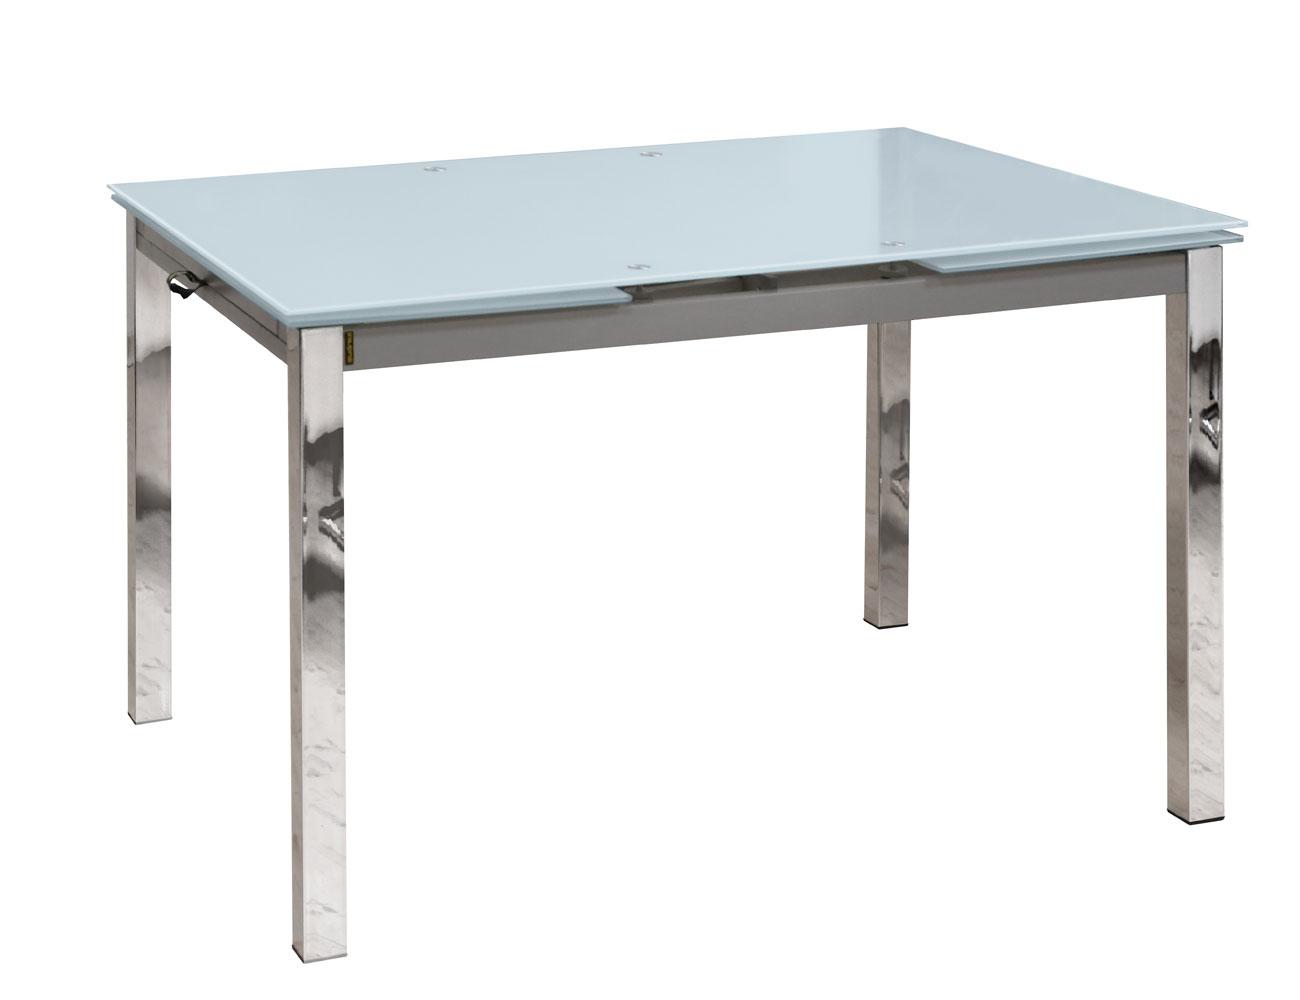 Mesa comedor extensible cristal templado 210 blanco